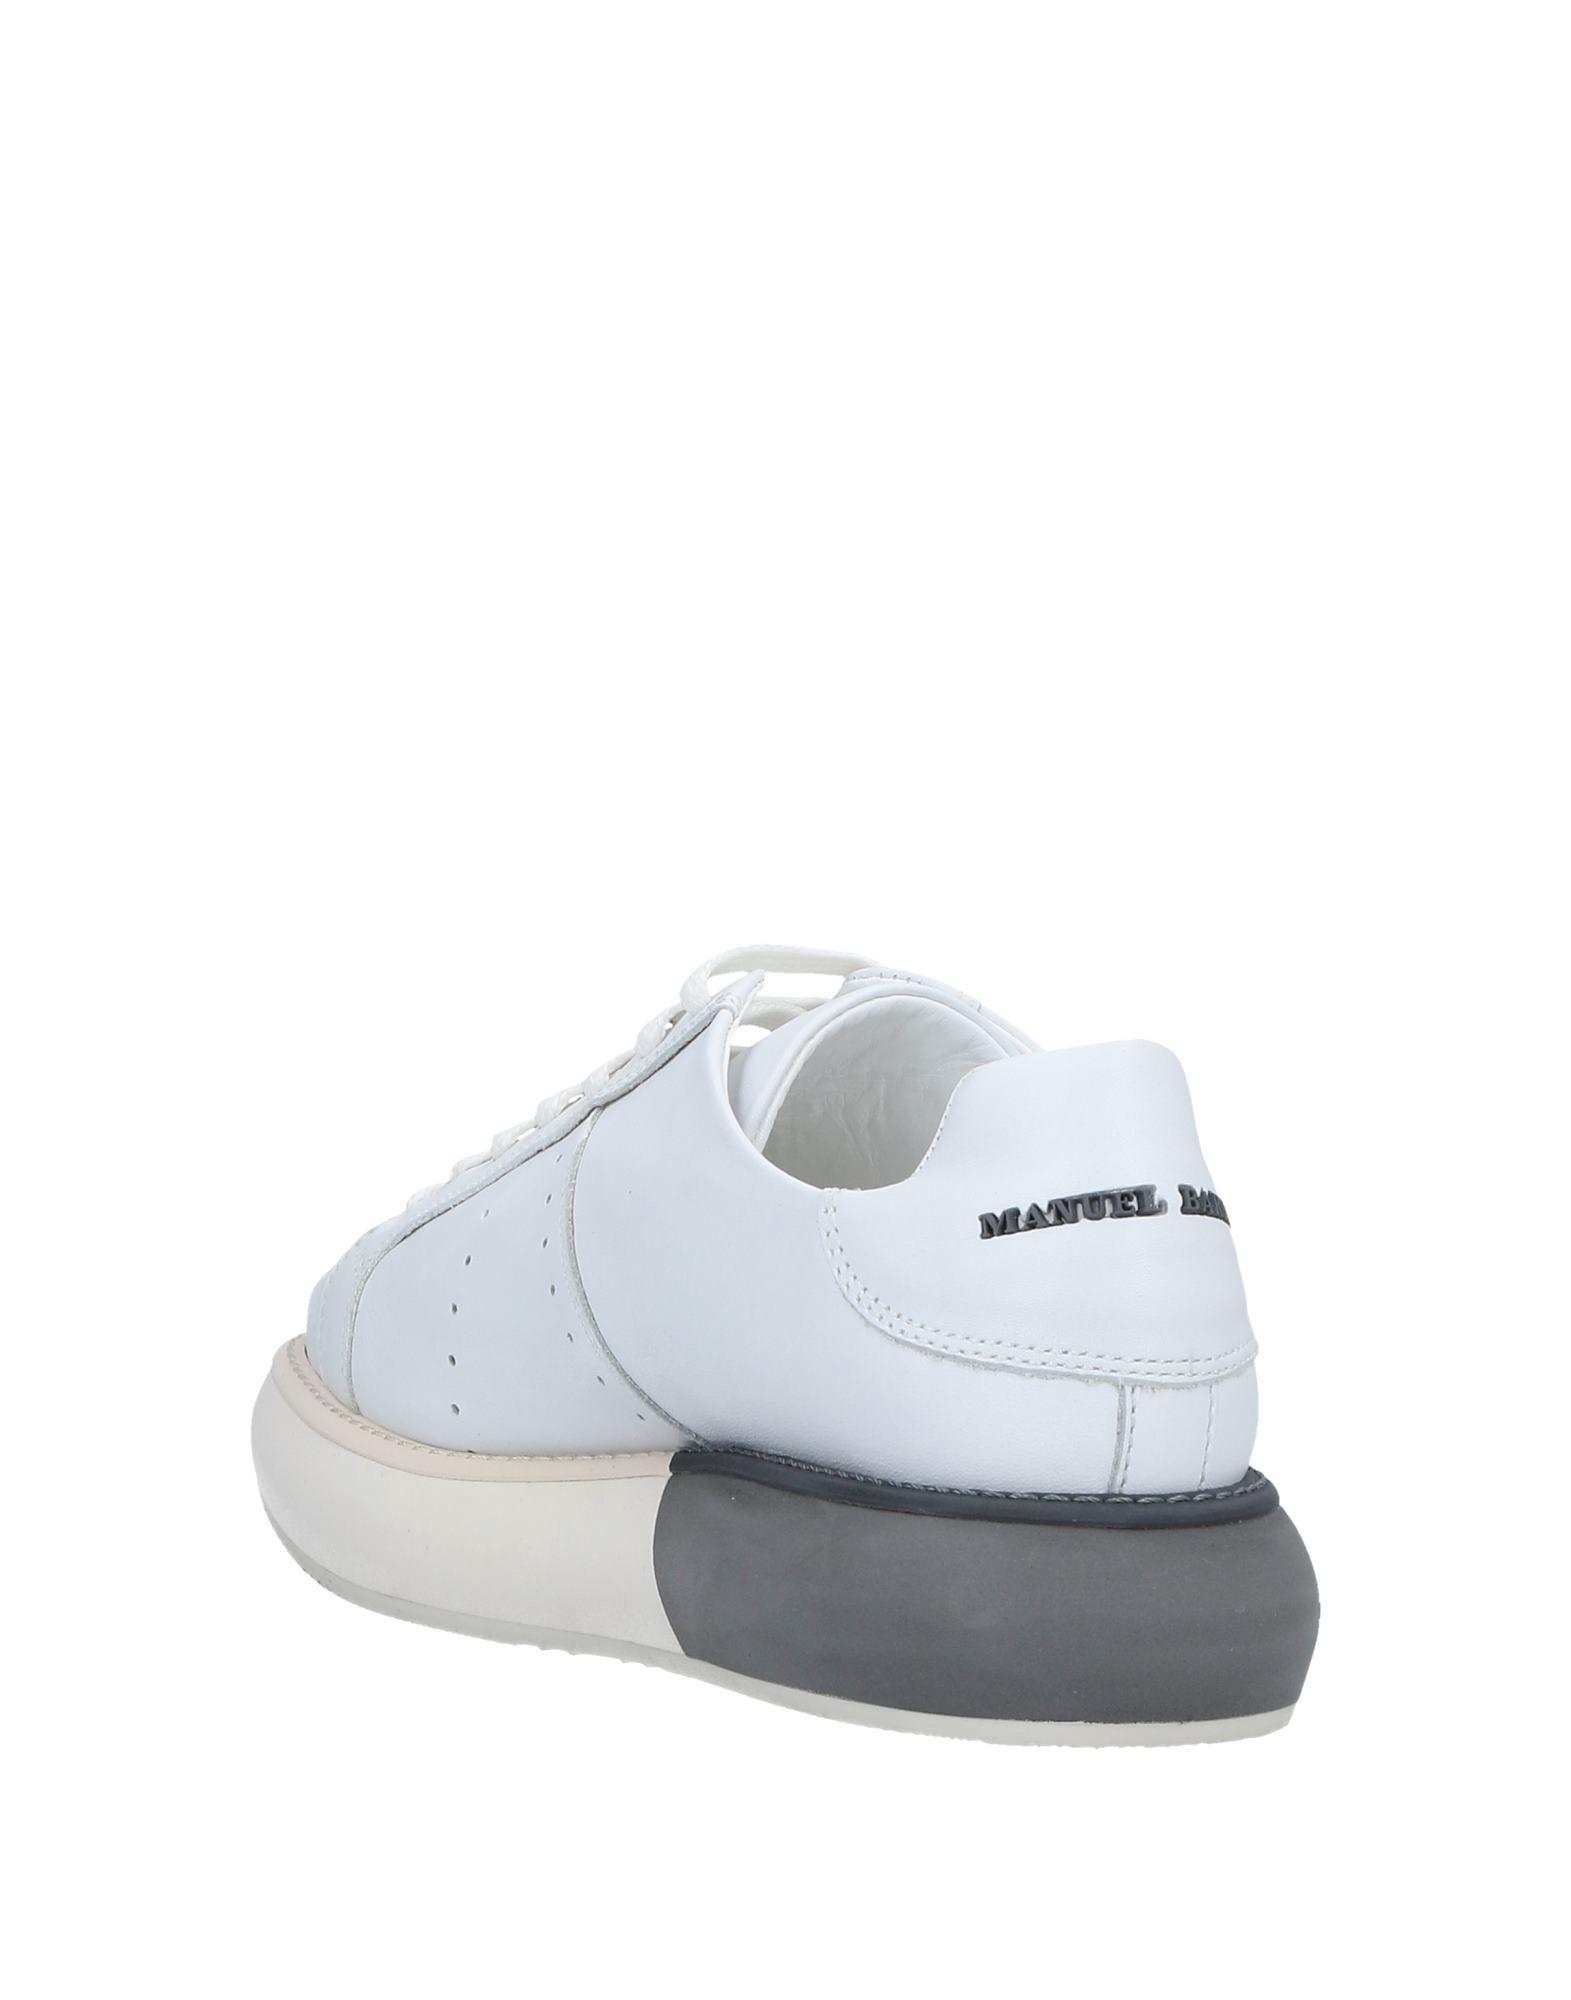 Stilvolle billige Schuhe Damen Manuel Barceló Sneakers Damen Schuhe  11538979TB c377d5